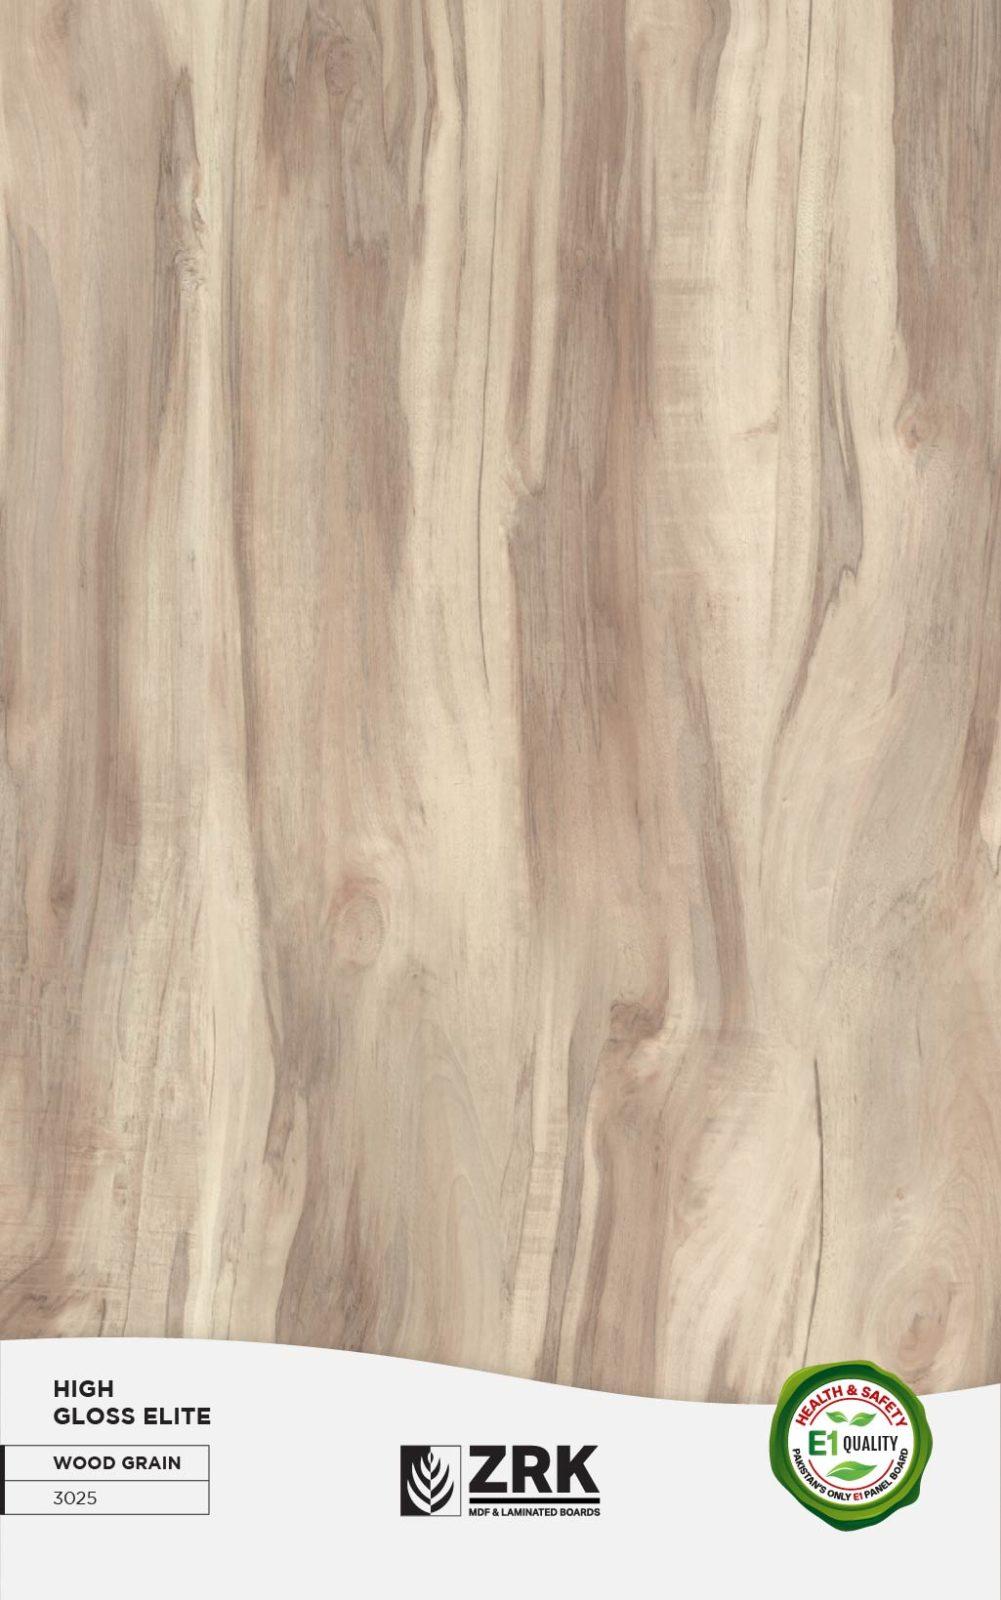 High Gloss Elite - Wood Grain - 3025